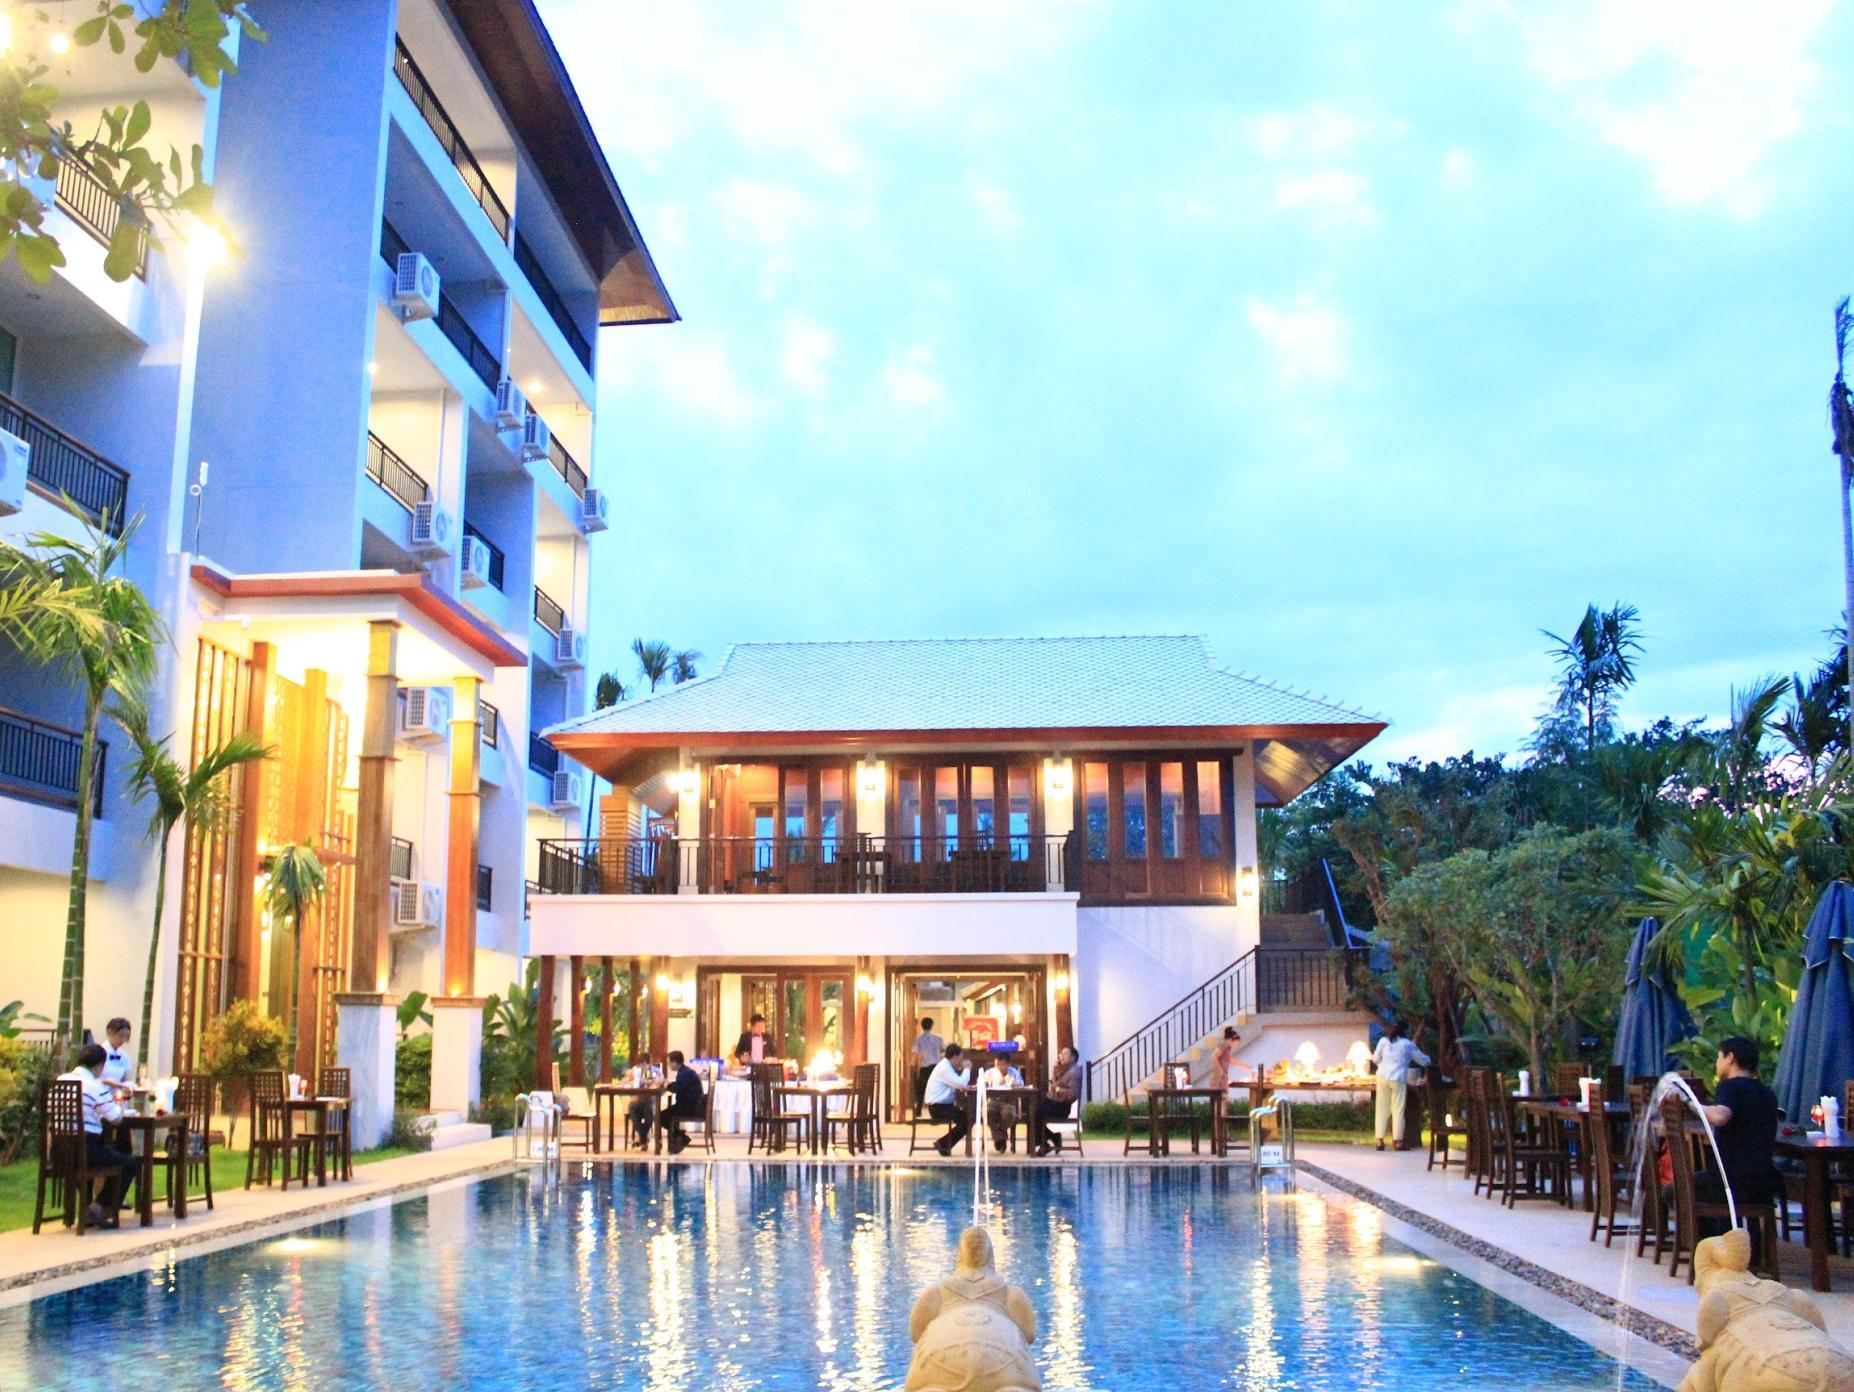 Kham Mon Lanna Resort Chiang Mai